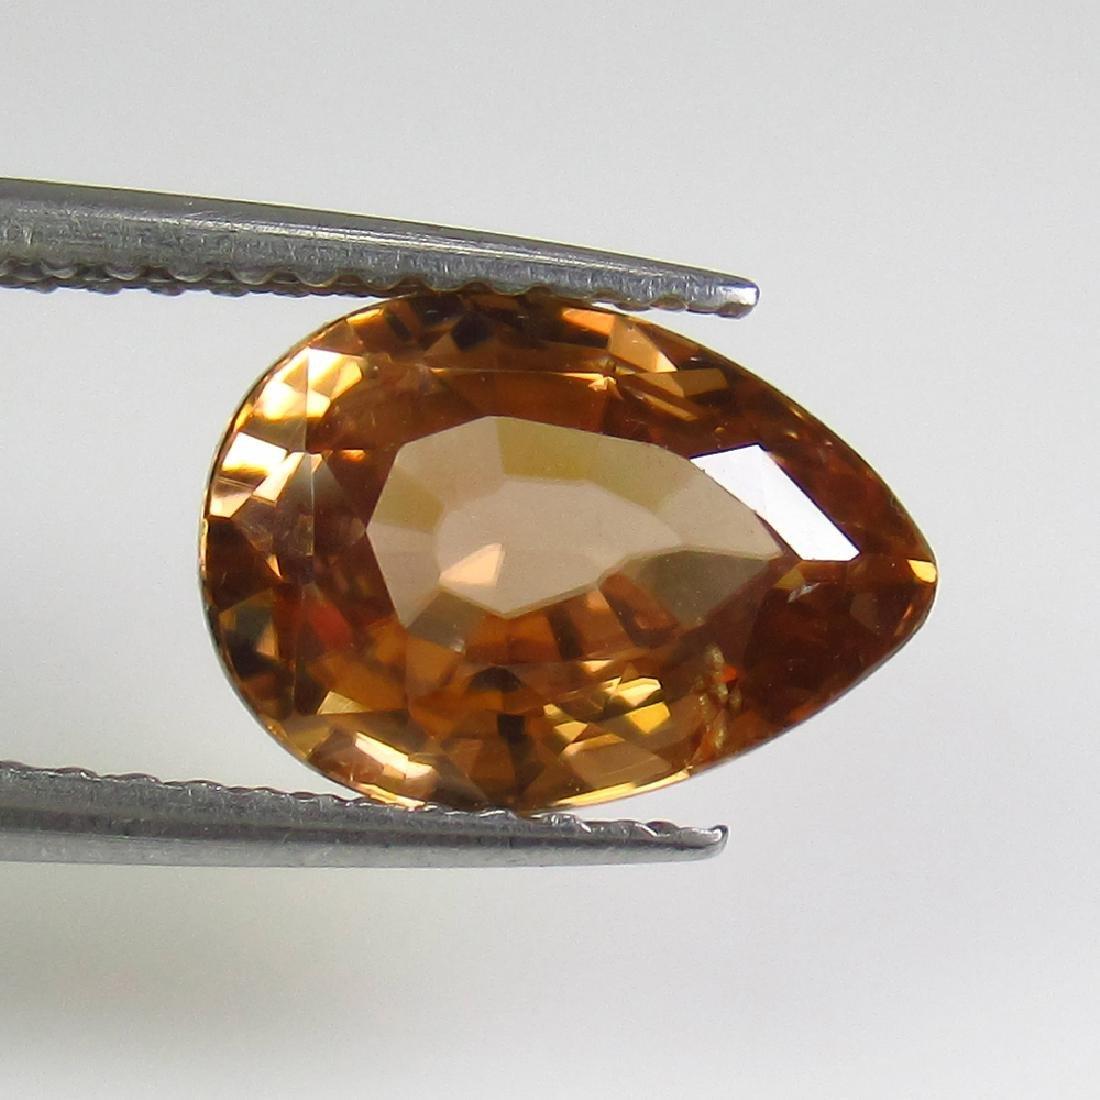 3.42 Ct Genuine Yellowish Orange Zircon 10X7 mm Pear